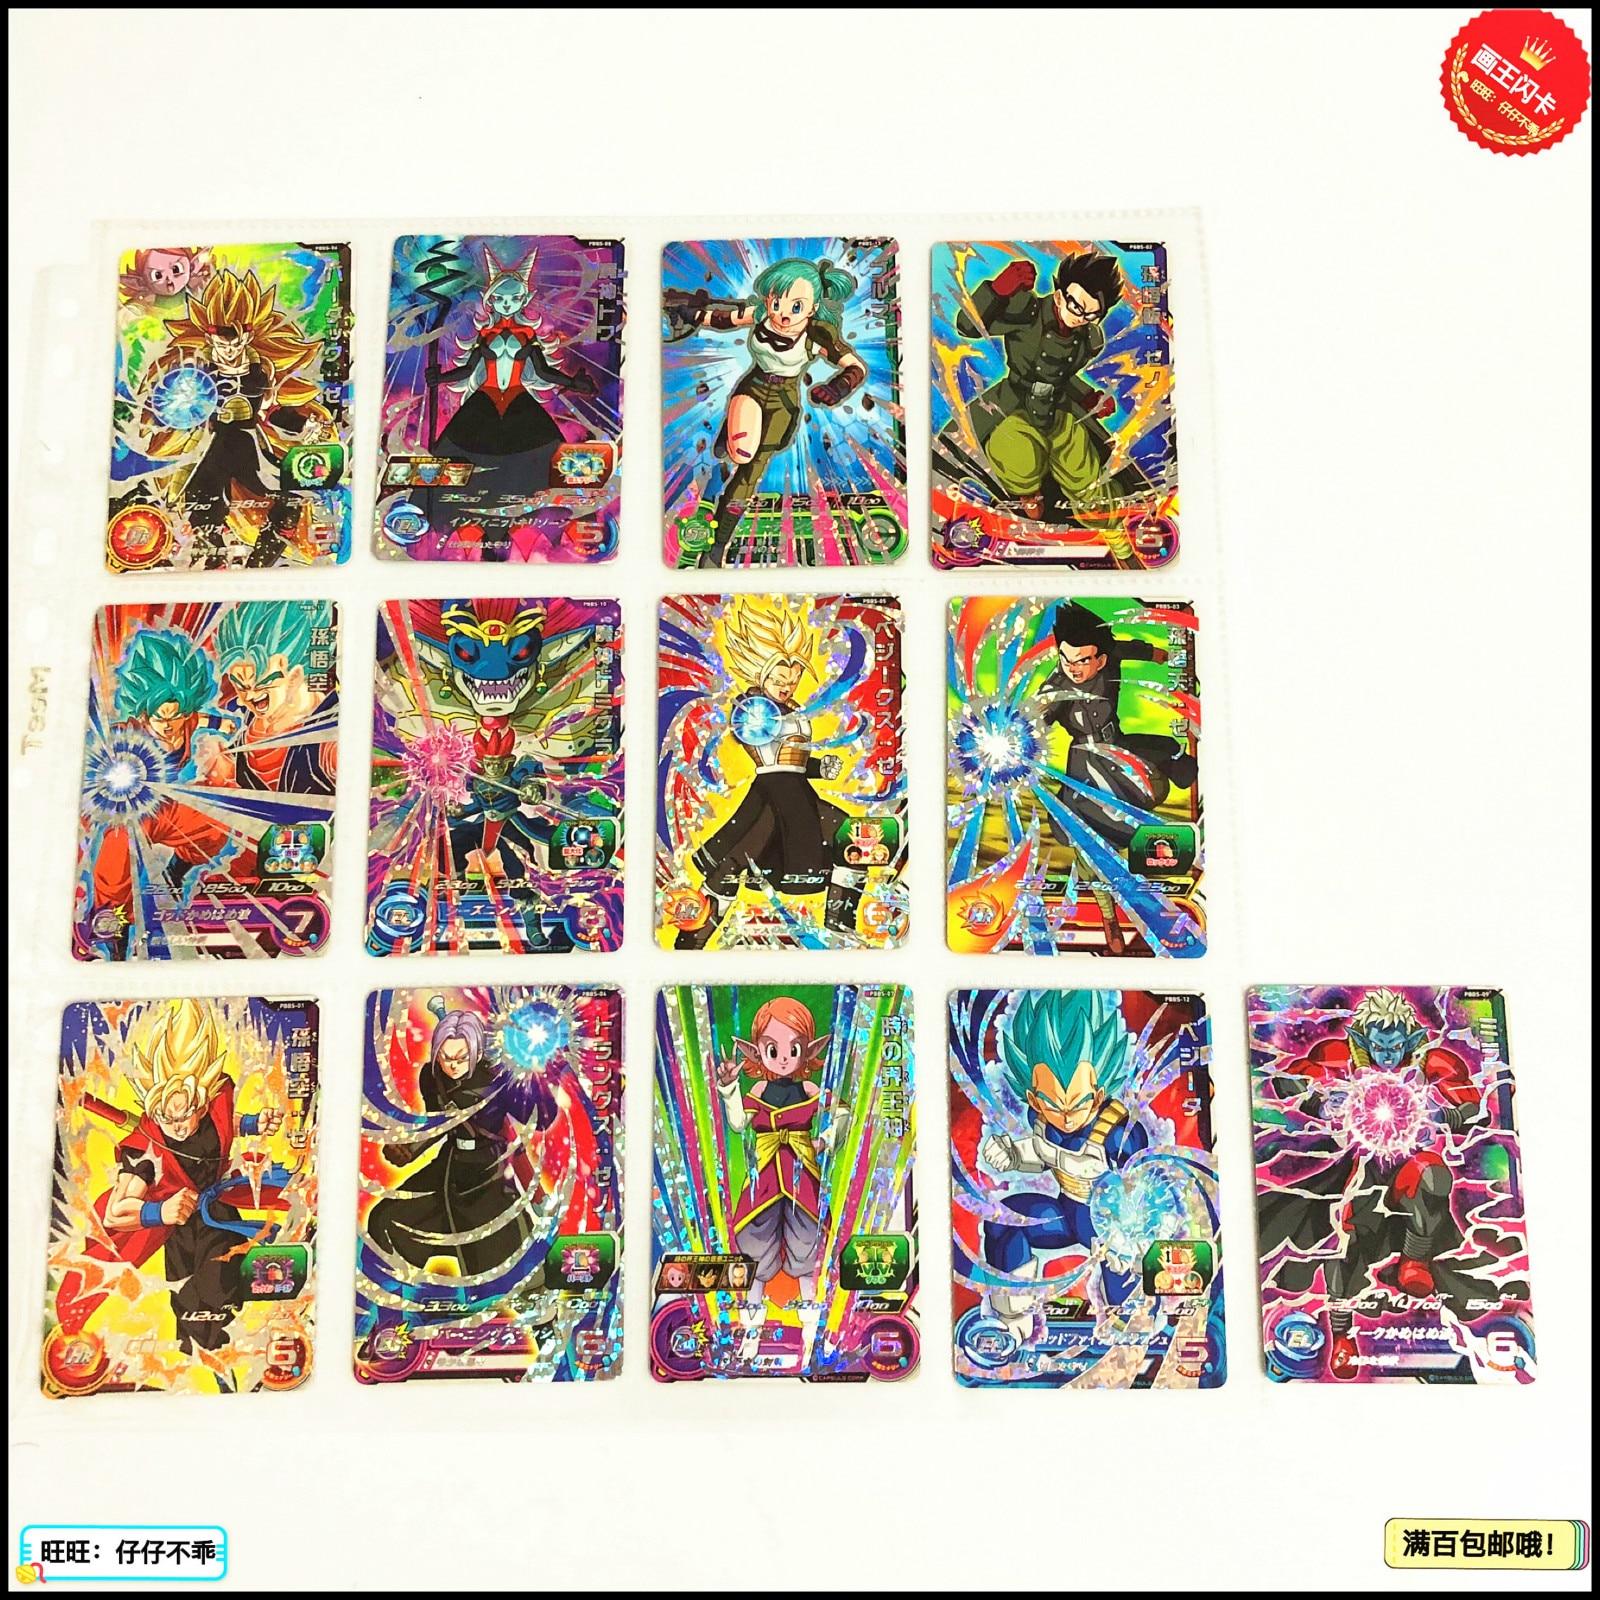 Japan Original Dragon Ball Hero Card PBBS Goku Toys Hobbies Collectibles Game Collection Anime Cards